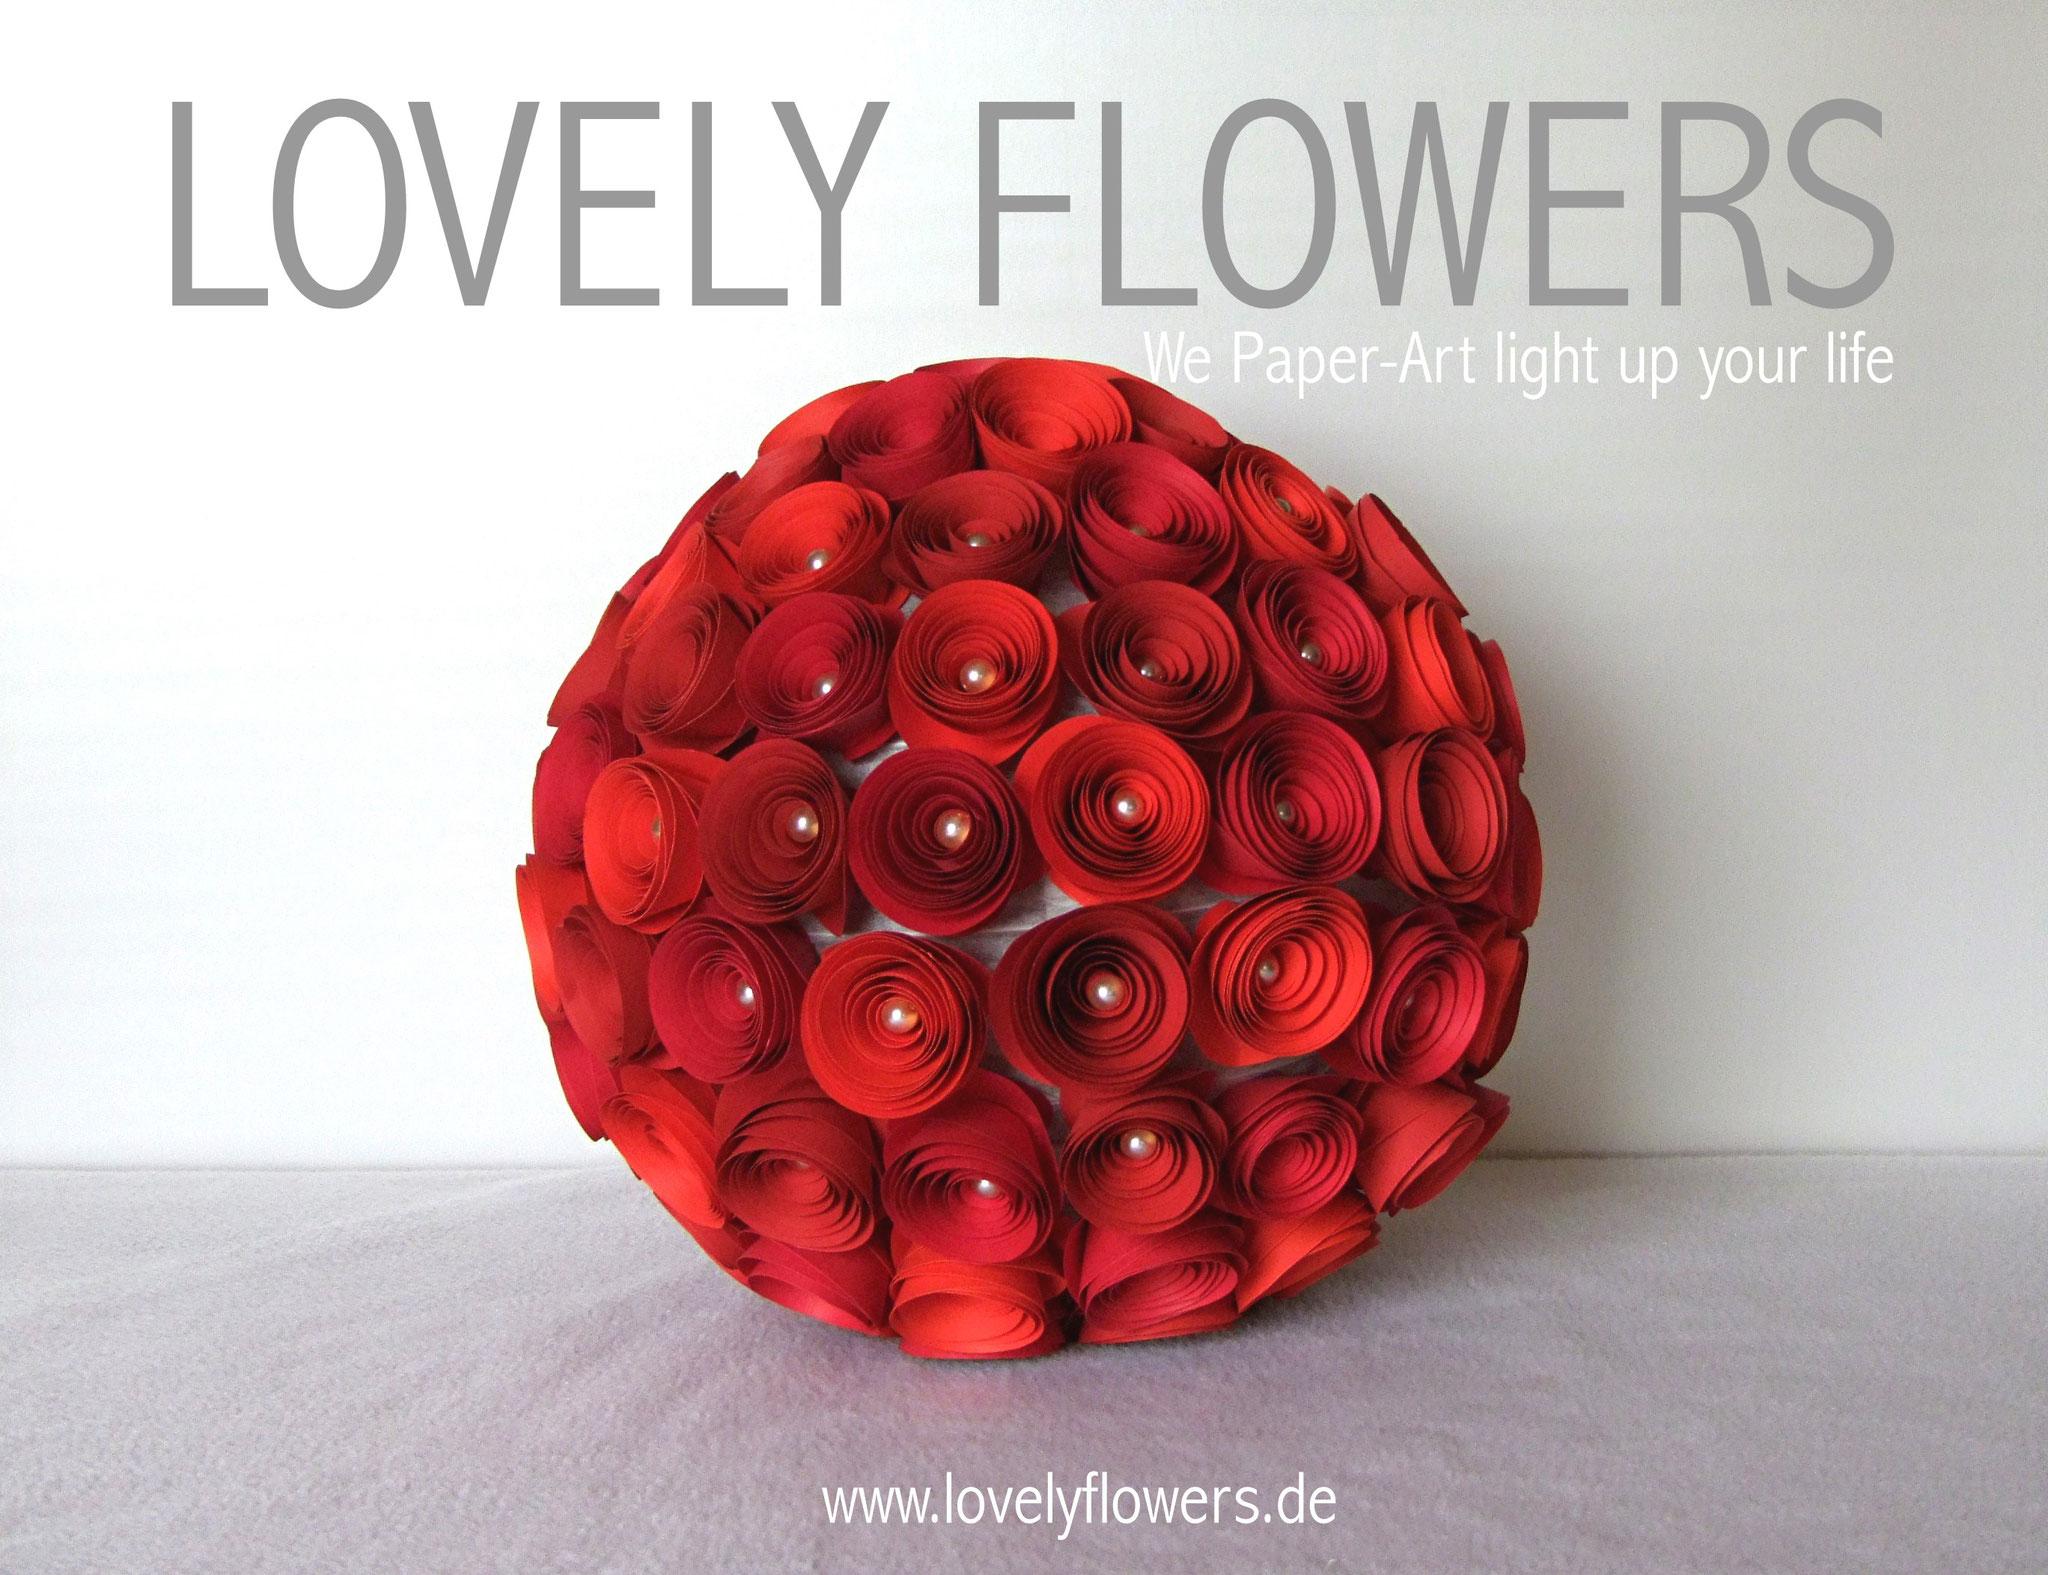 www.lovelyflowers.de - Paper Art Lampen in Rot erwecken die Leidenschaft!